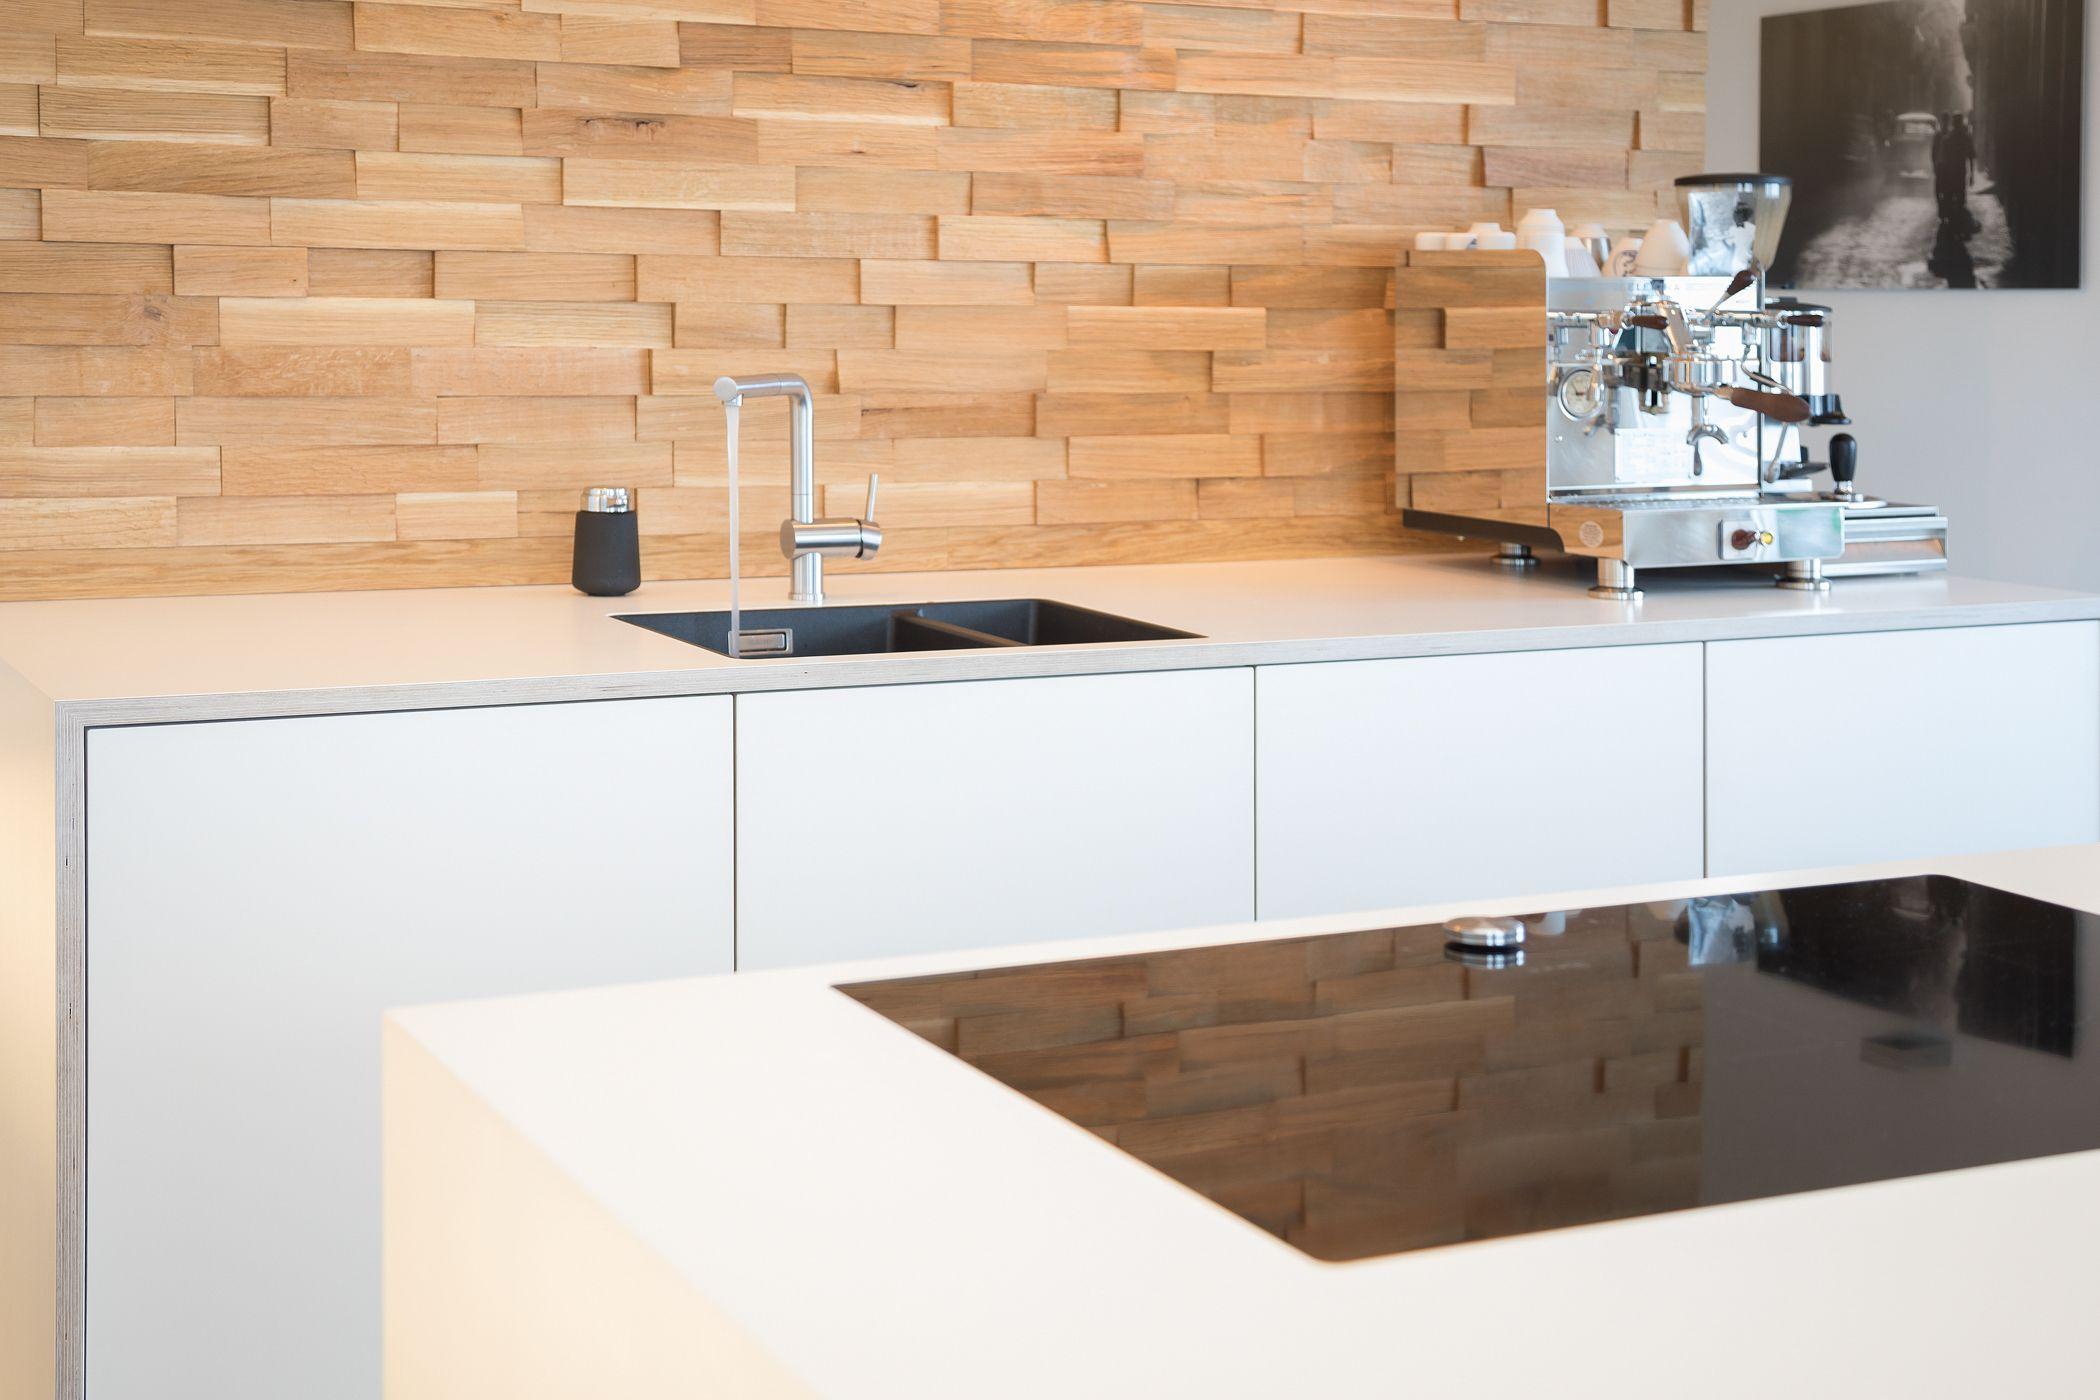 Full Size of Grifflose Küche Griffmulde Grifflose Küche Vor Und Nachteile Grifflose Küche Sinnvoll Grifflose Küche Fingerabdrücke Küche Grifflose Küche